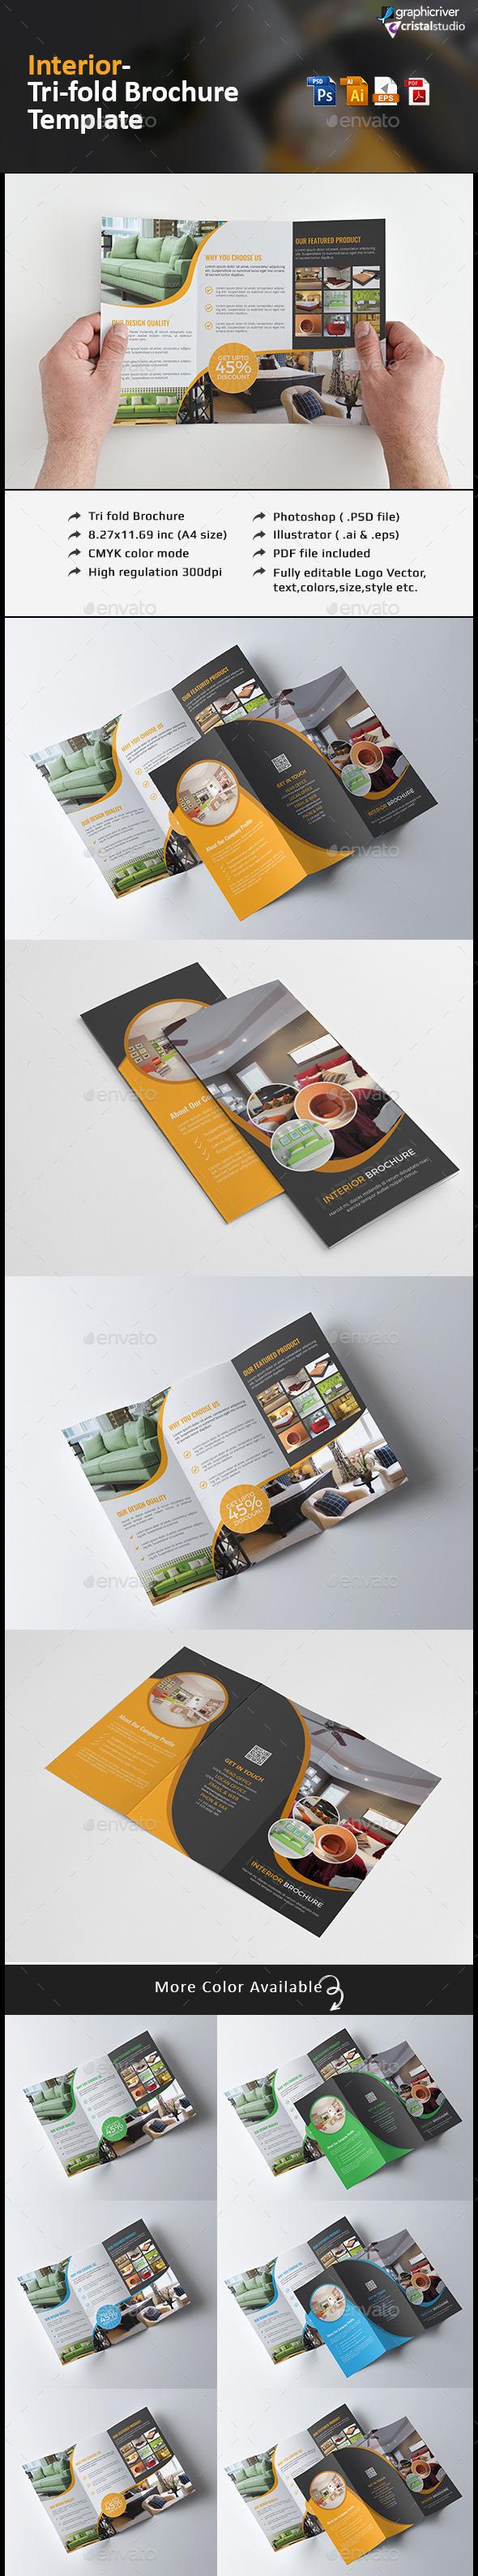 Interior Tri fold Brochure - Corporate Brochures